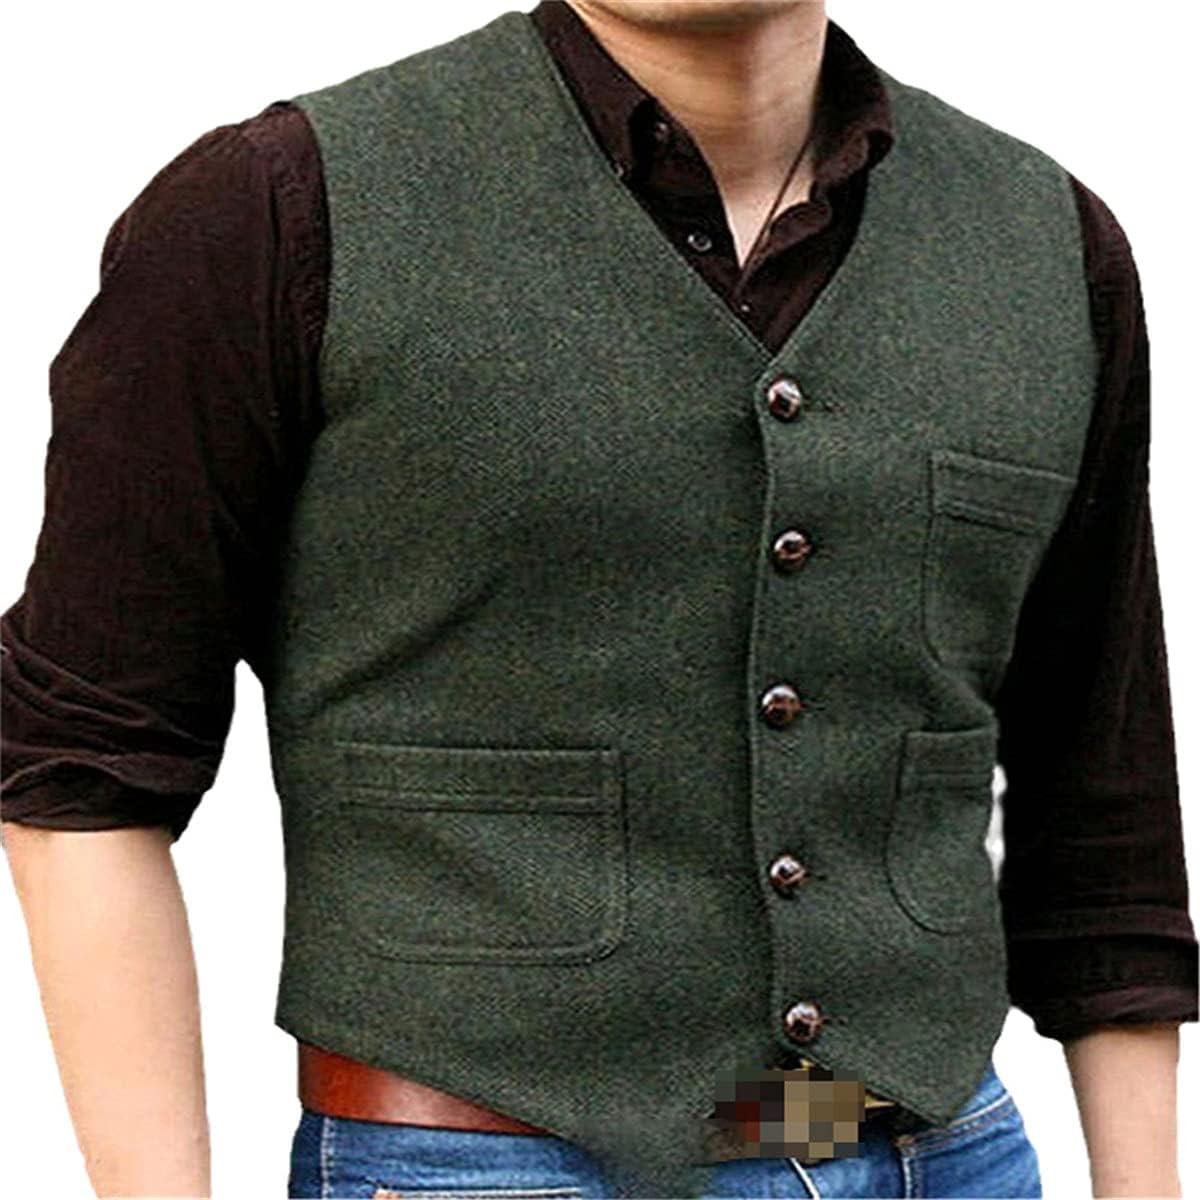 Men's vest tweed suit business vest steampunk vest jacket brown black Victorian style